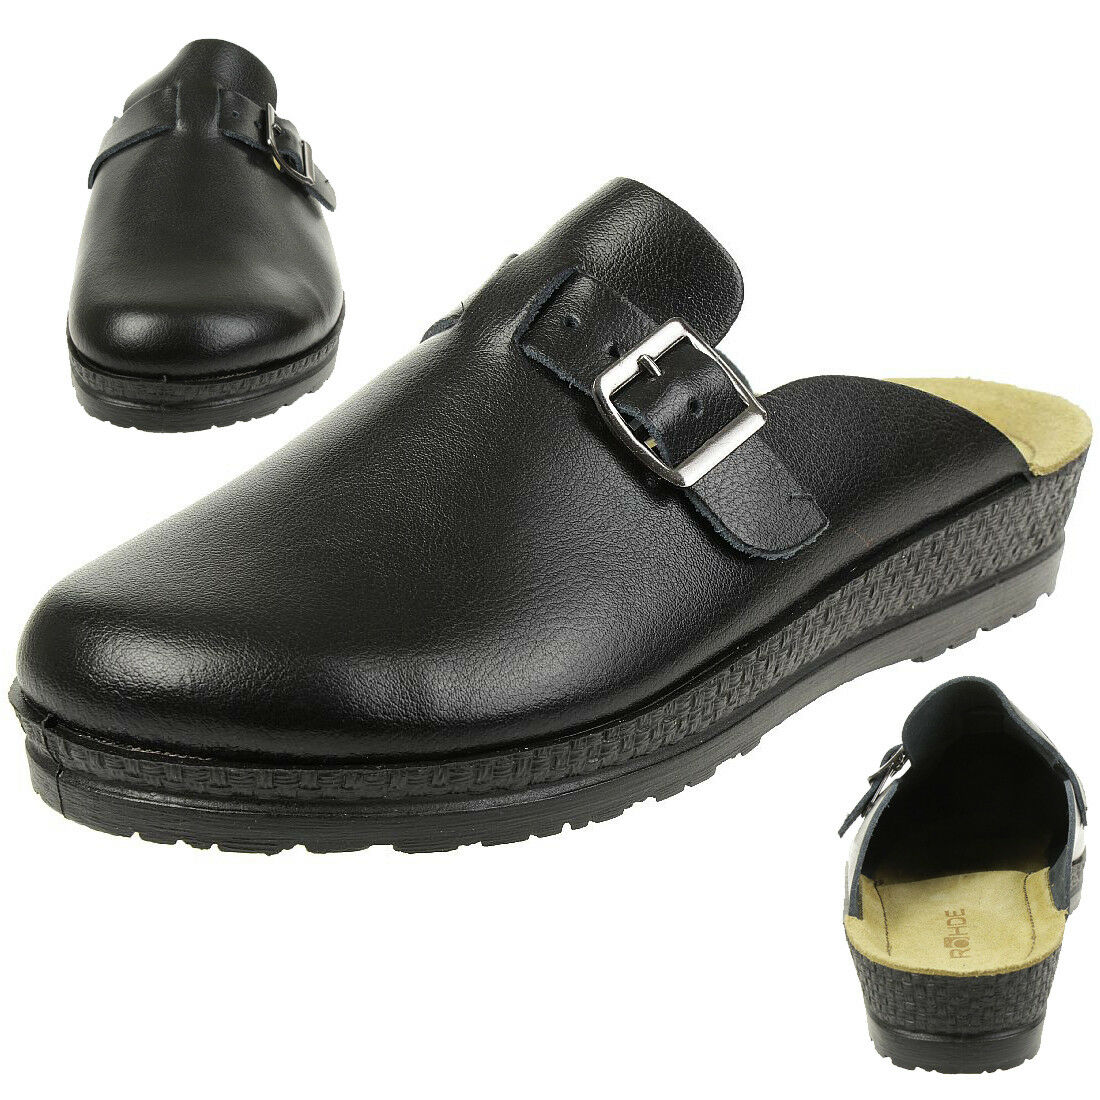 Rohde Neustadt D Zuecos Mujer Zapatos Zapatillas 1447 Negro